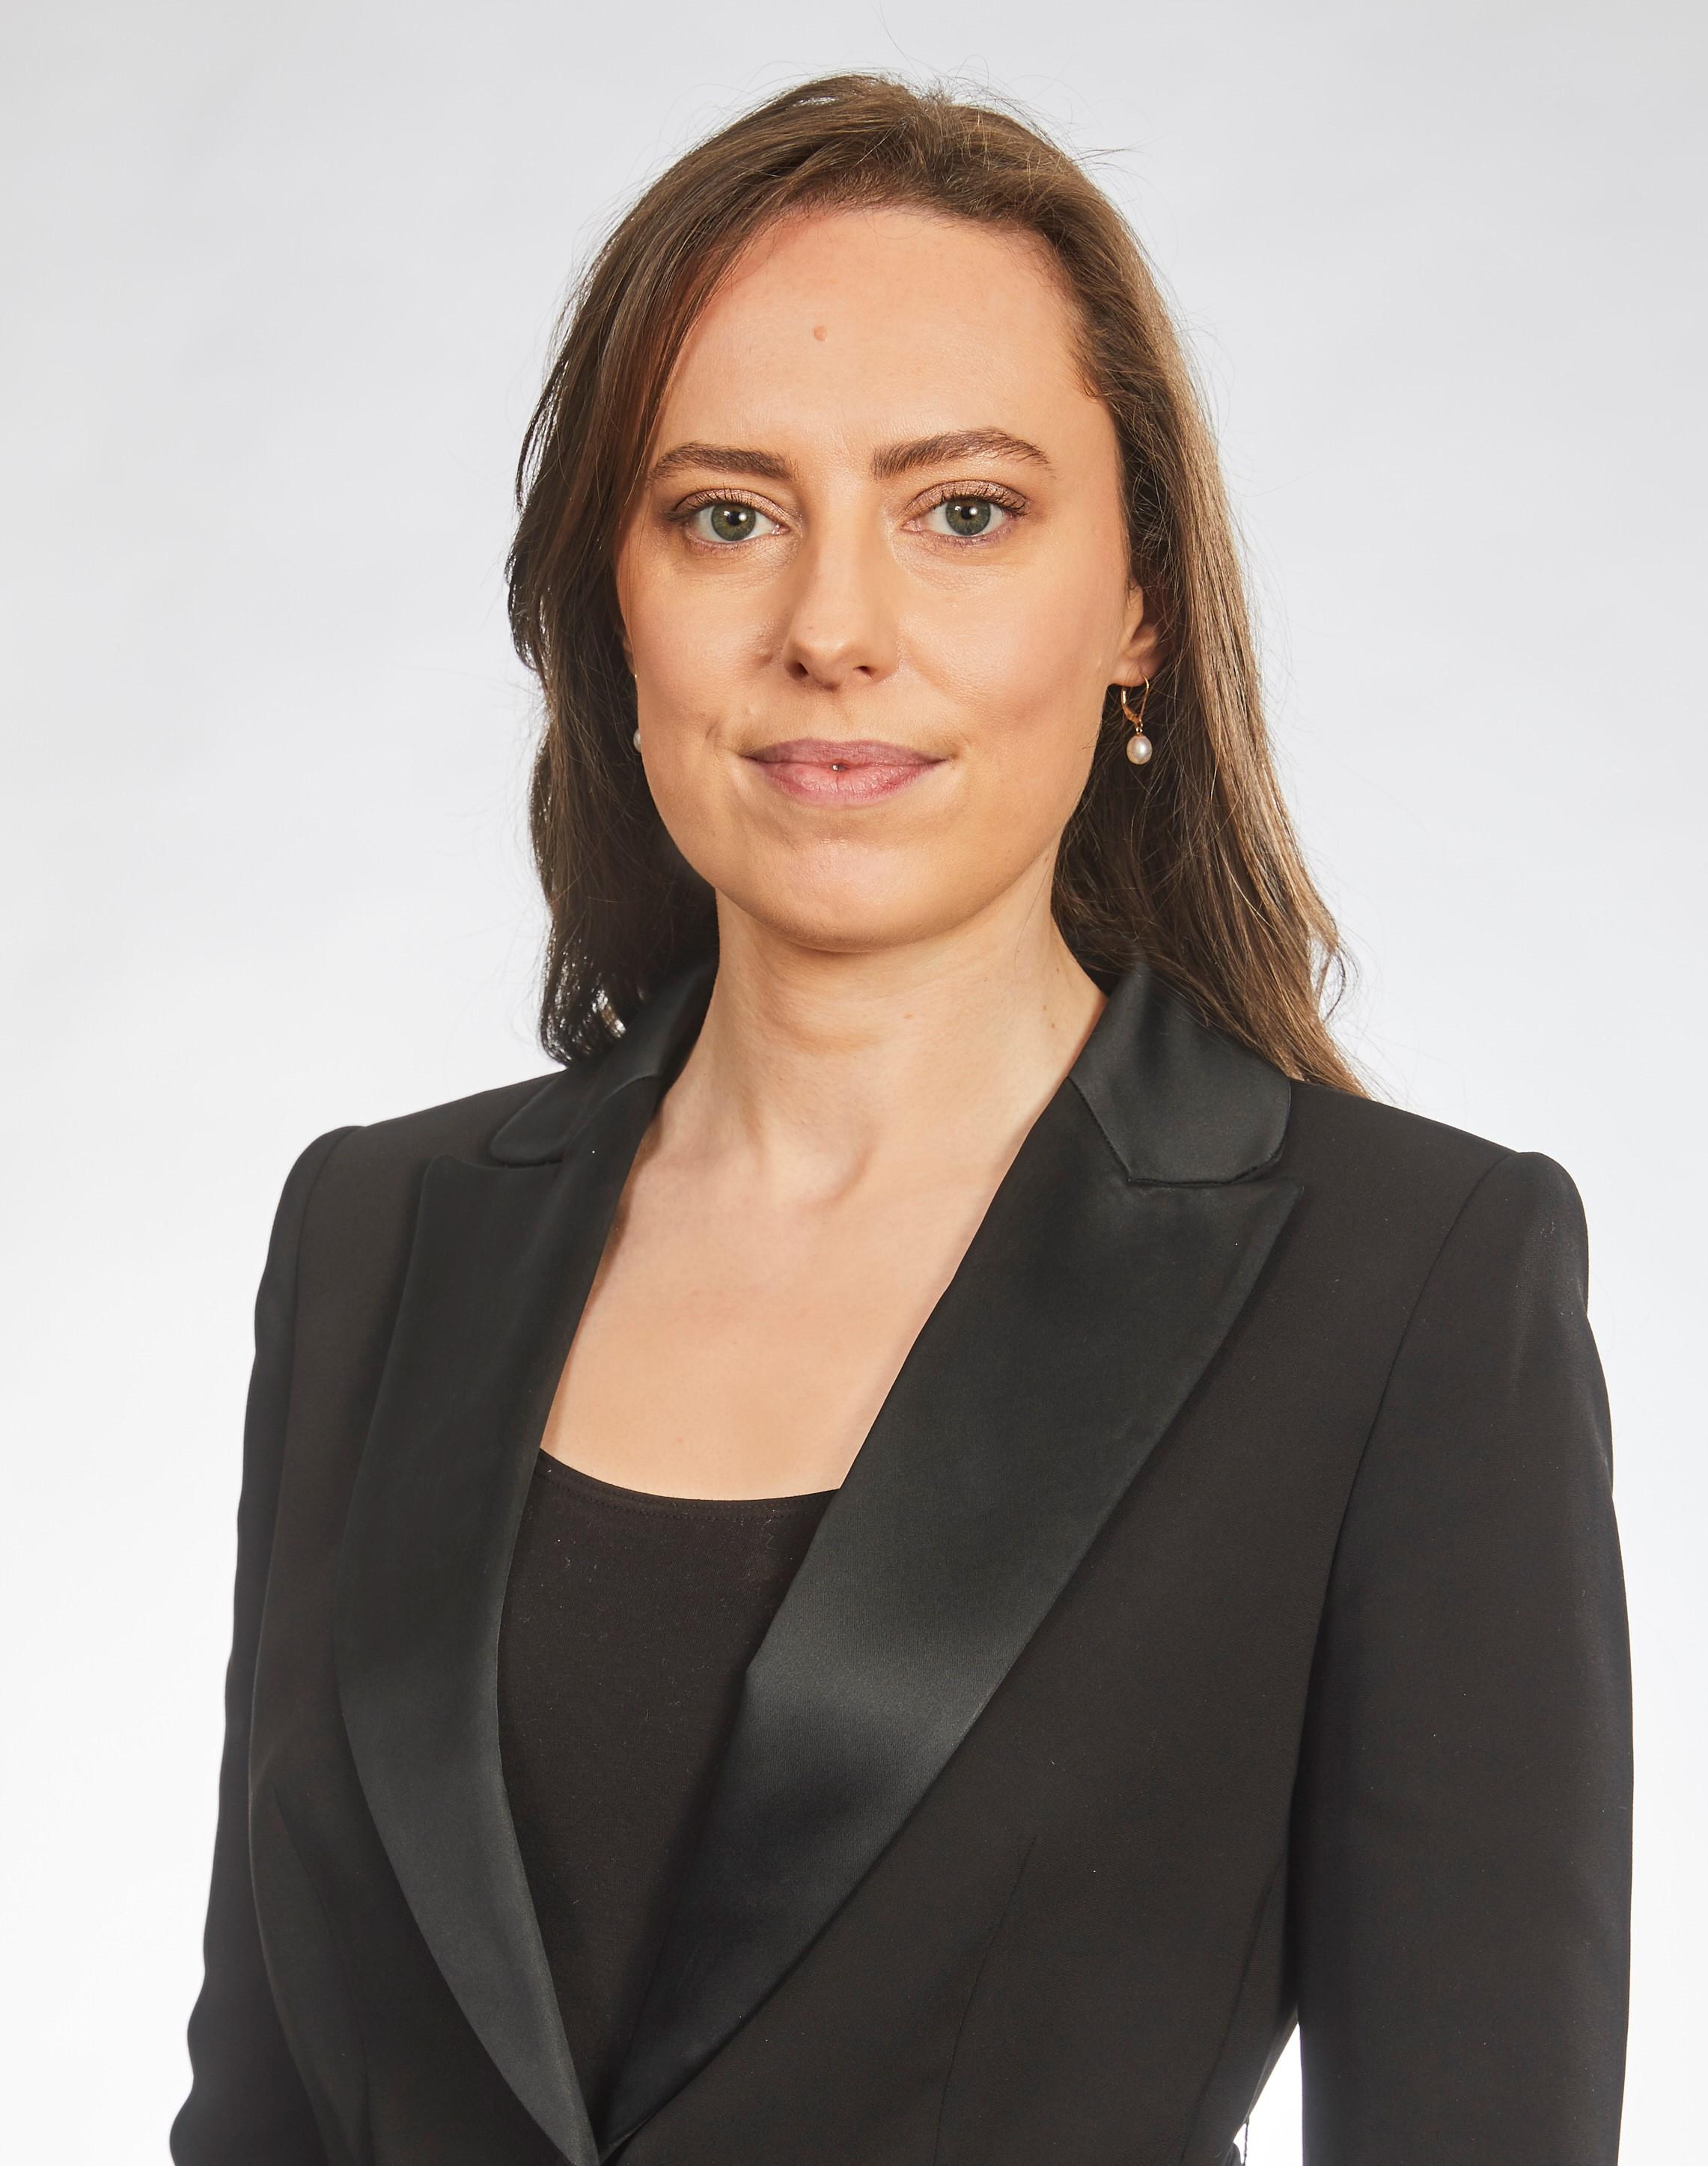 Kathleen Crennan, BA LLB (MELB)